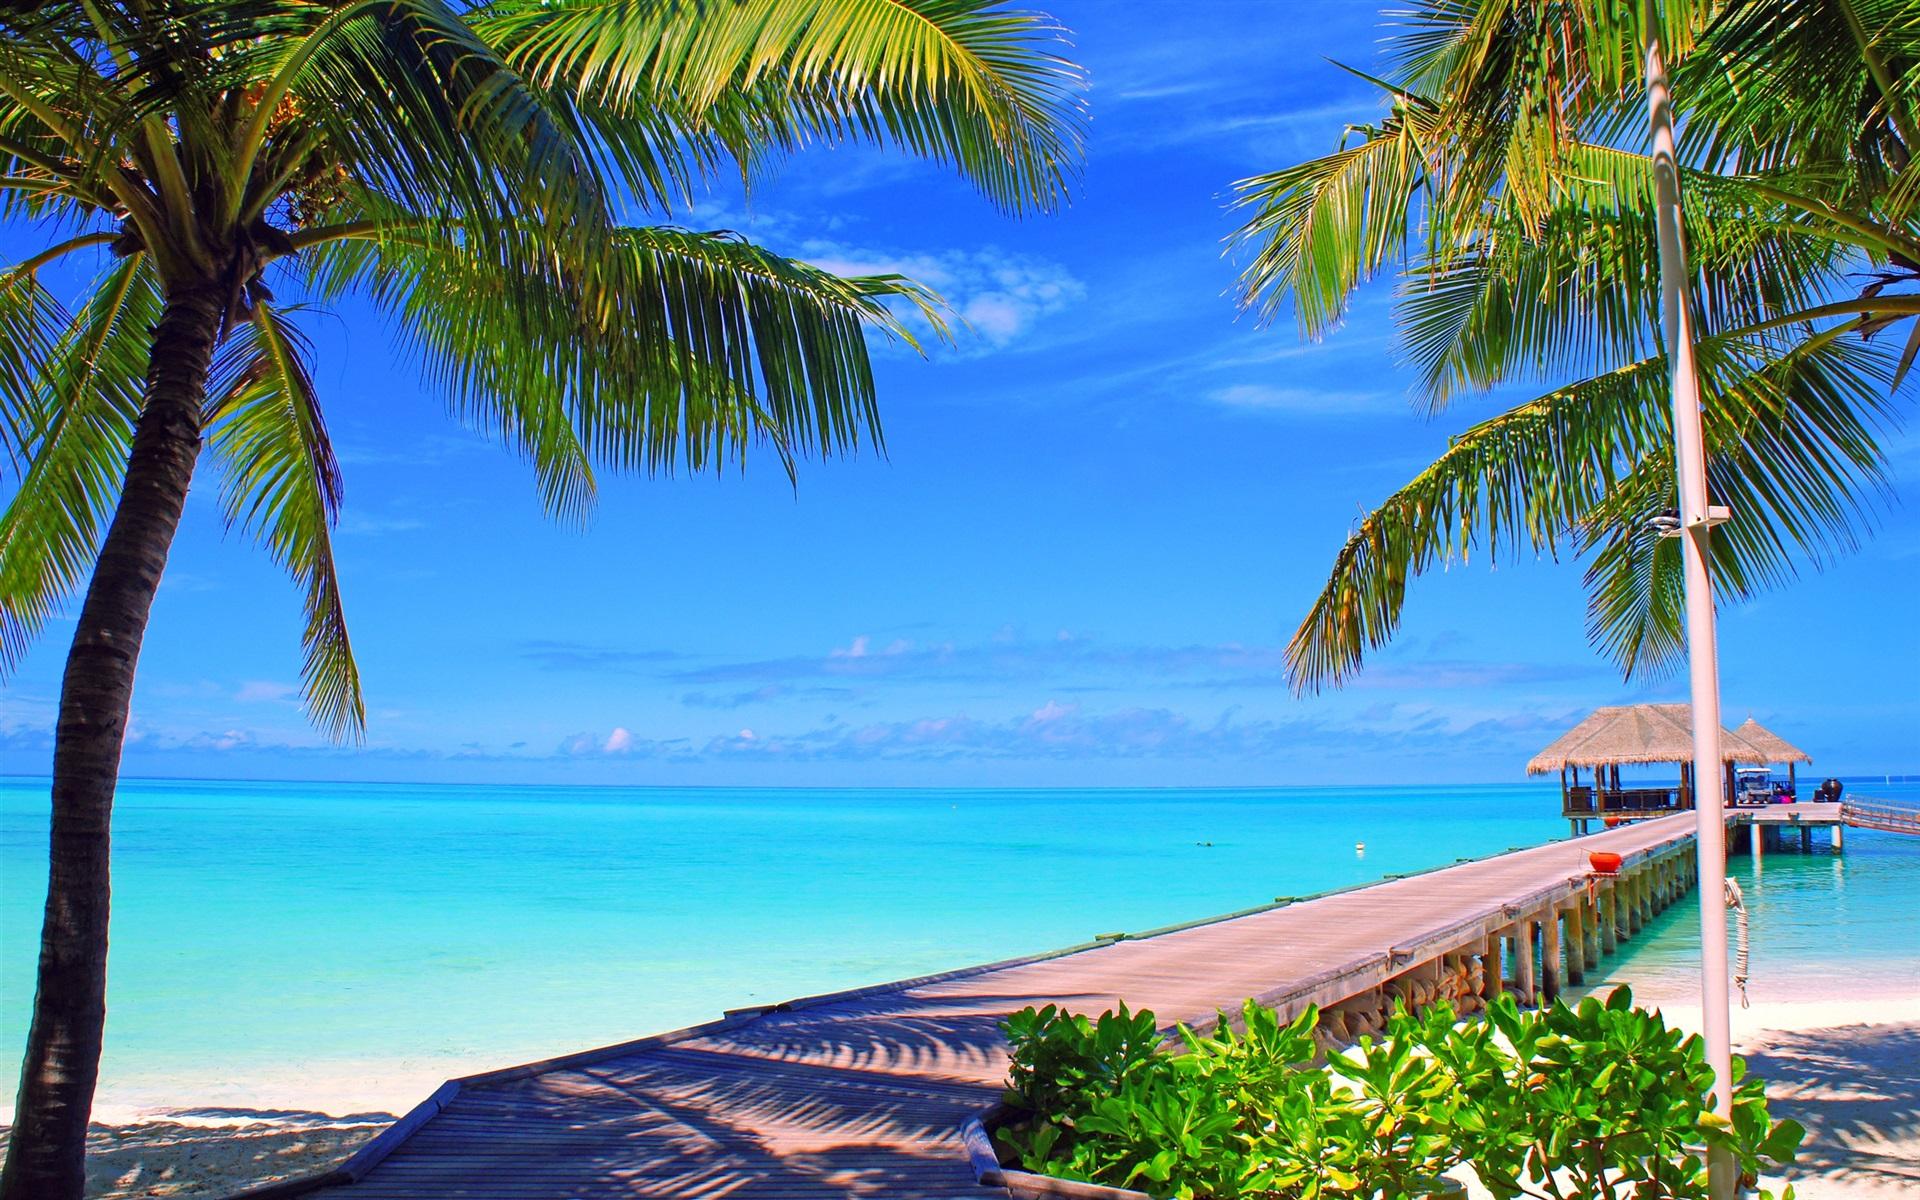 malediven insel palmen br cke bungalows meer ozean 2560x1600 hd hintergrundbilder hd bild. Black Bedroom Furniture Sets. Home Design Ideas